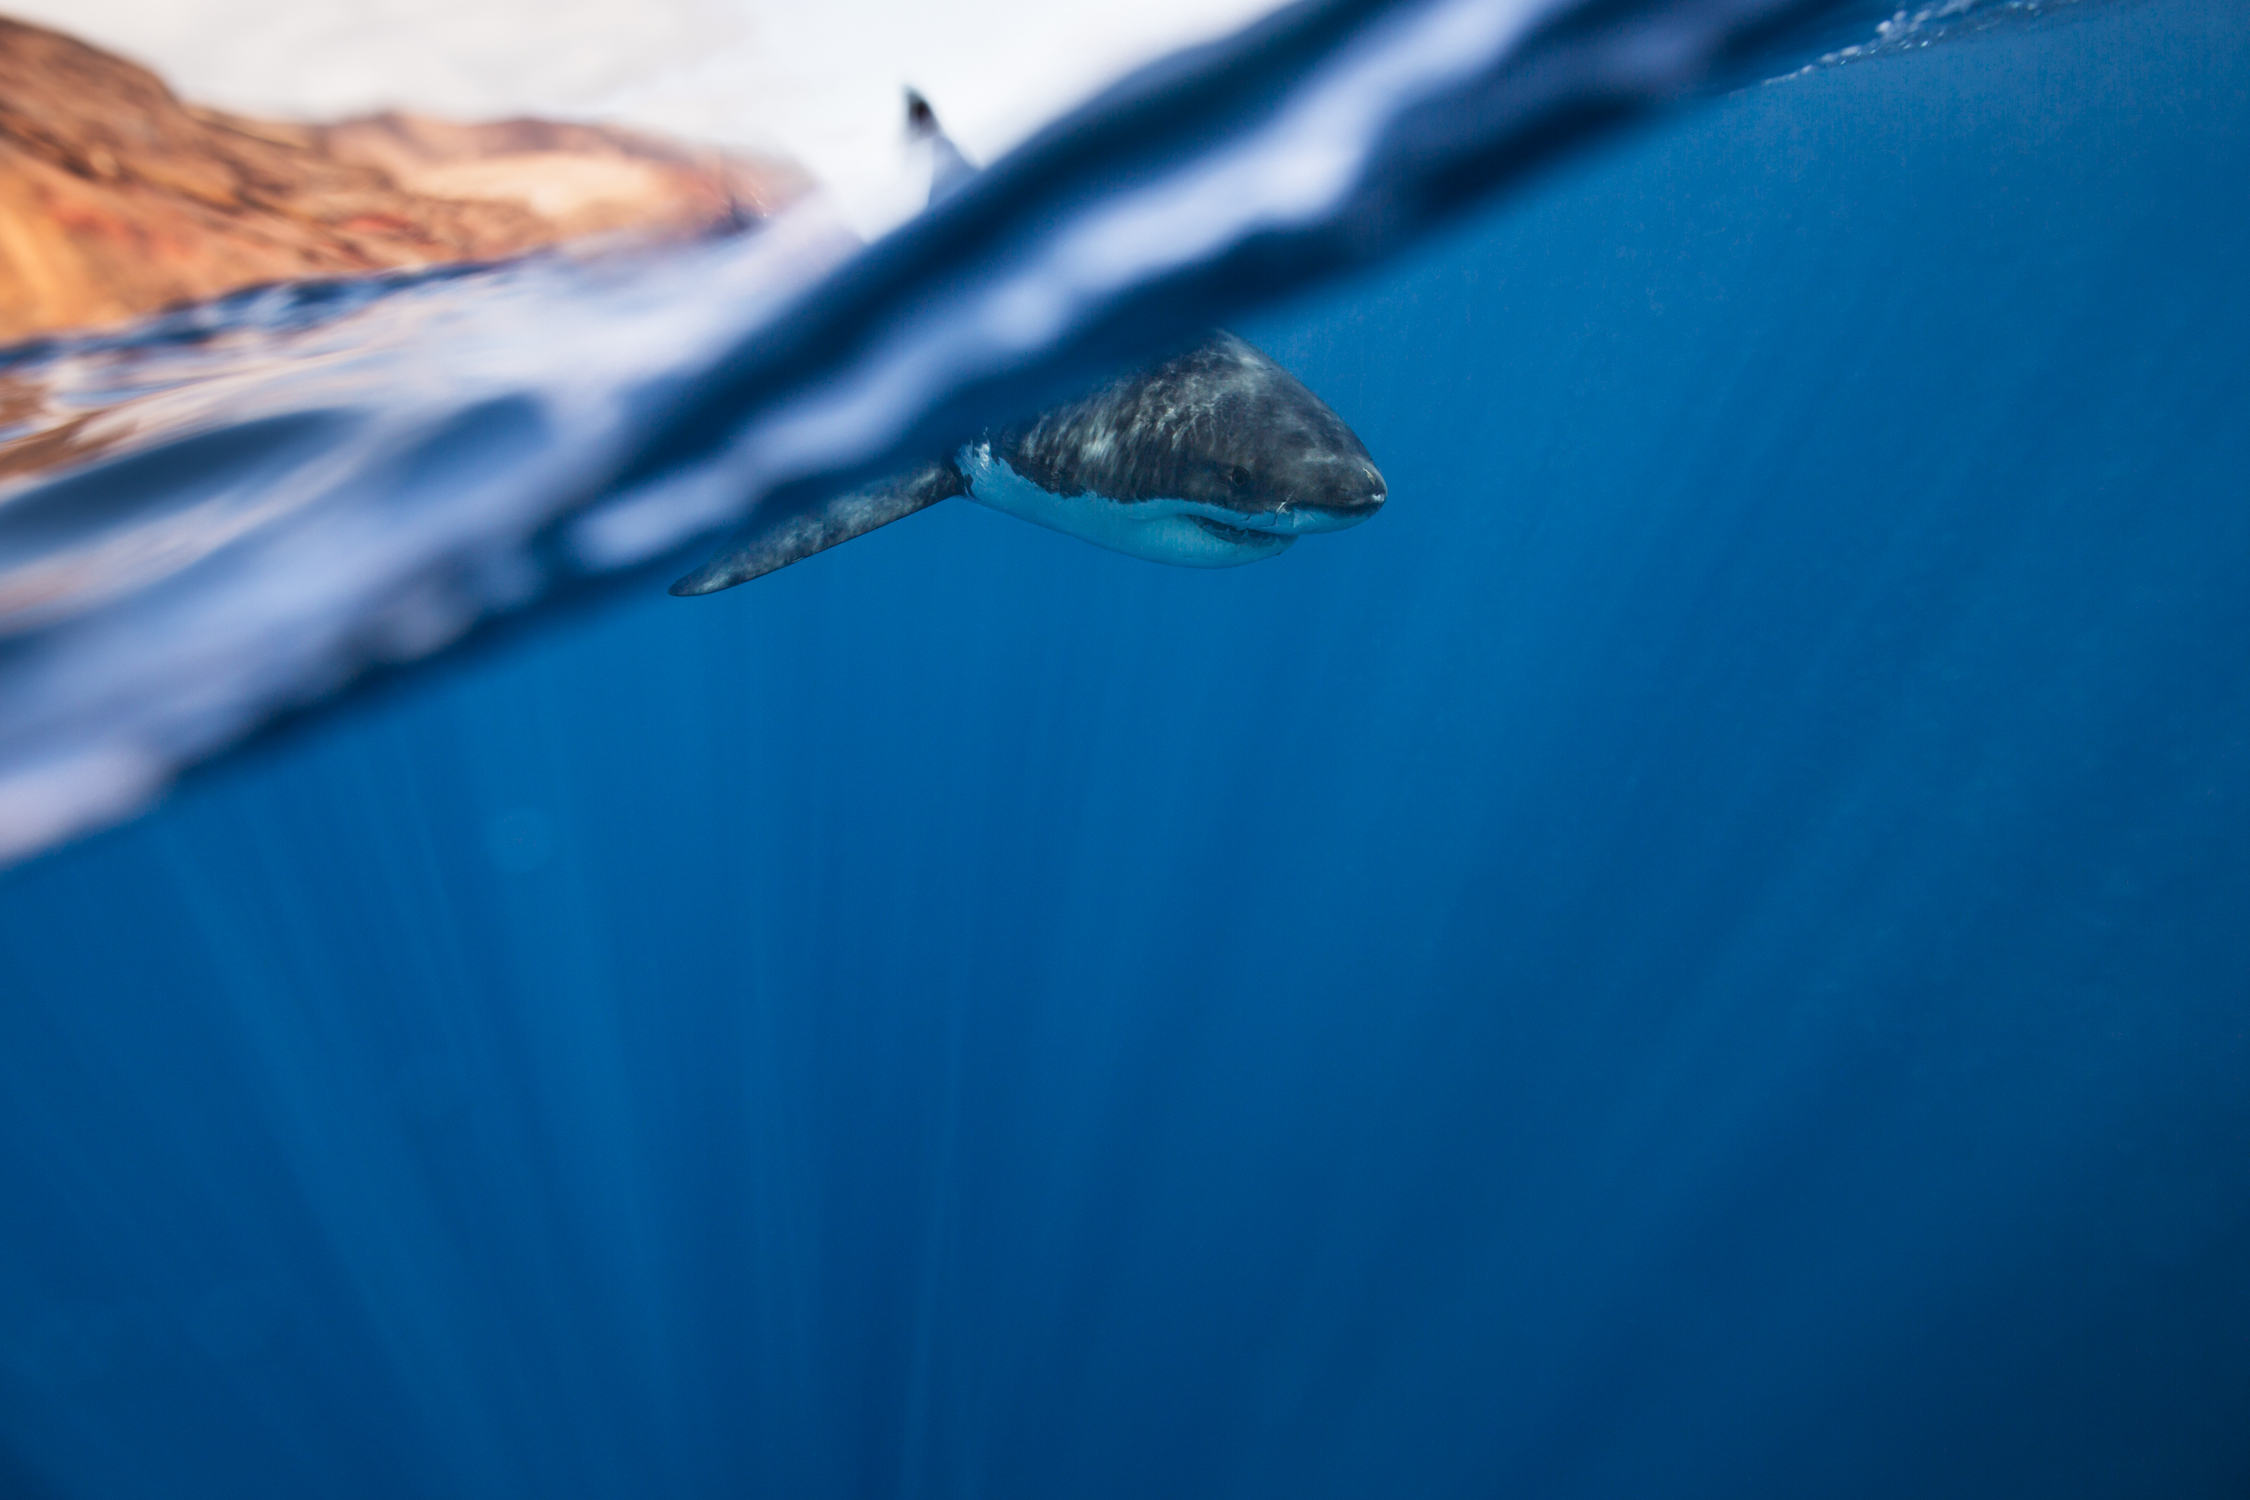 Corey-Arnold-Wolf-Tide-5,xlarge.2x.jpg